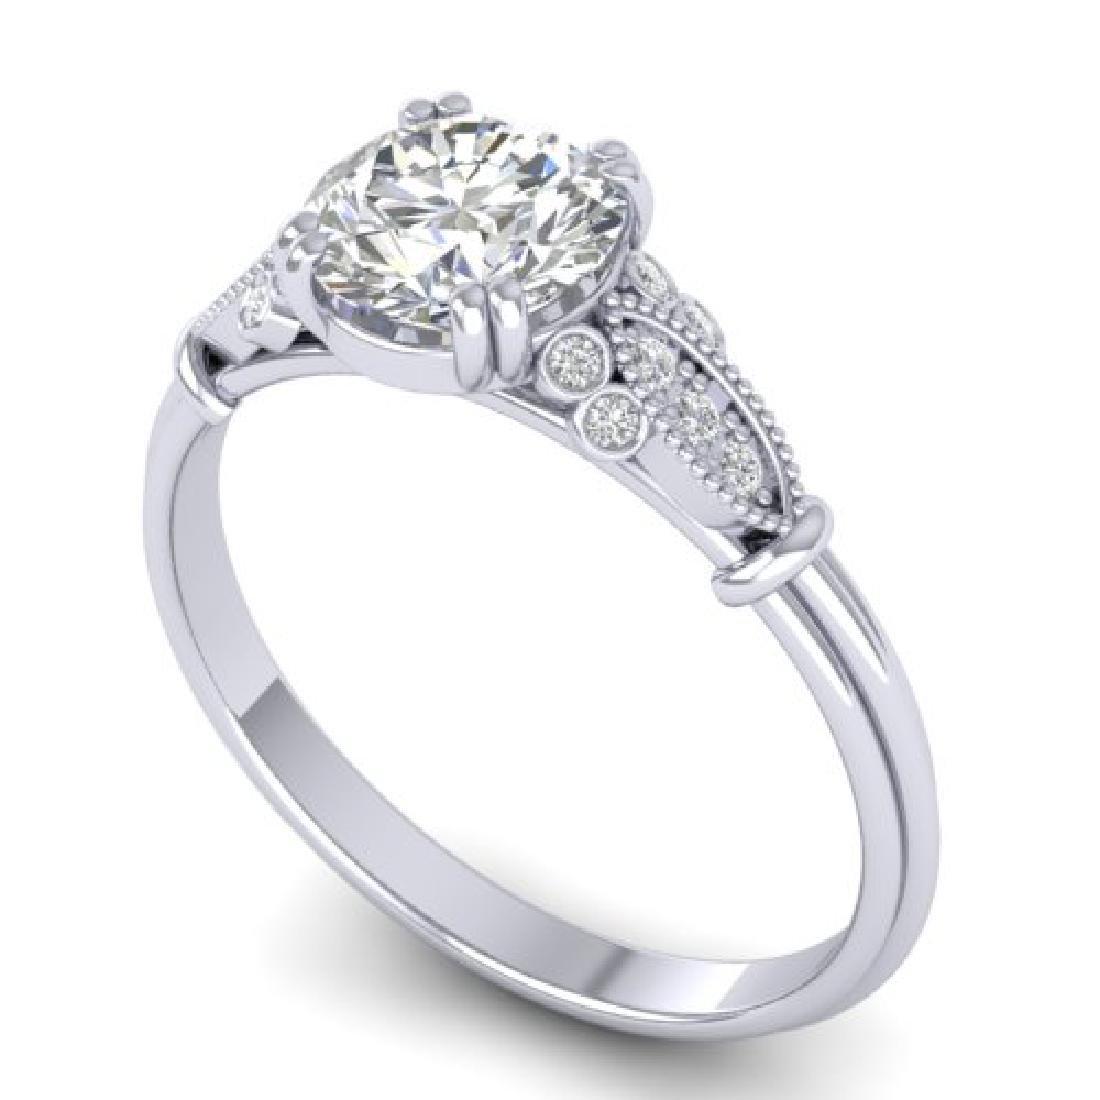 1.15 CTW Certified VS/SI Diamond Solitaire Art Deco - 2